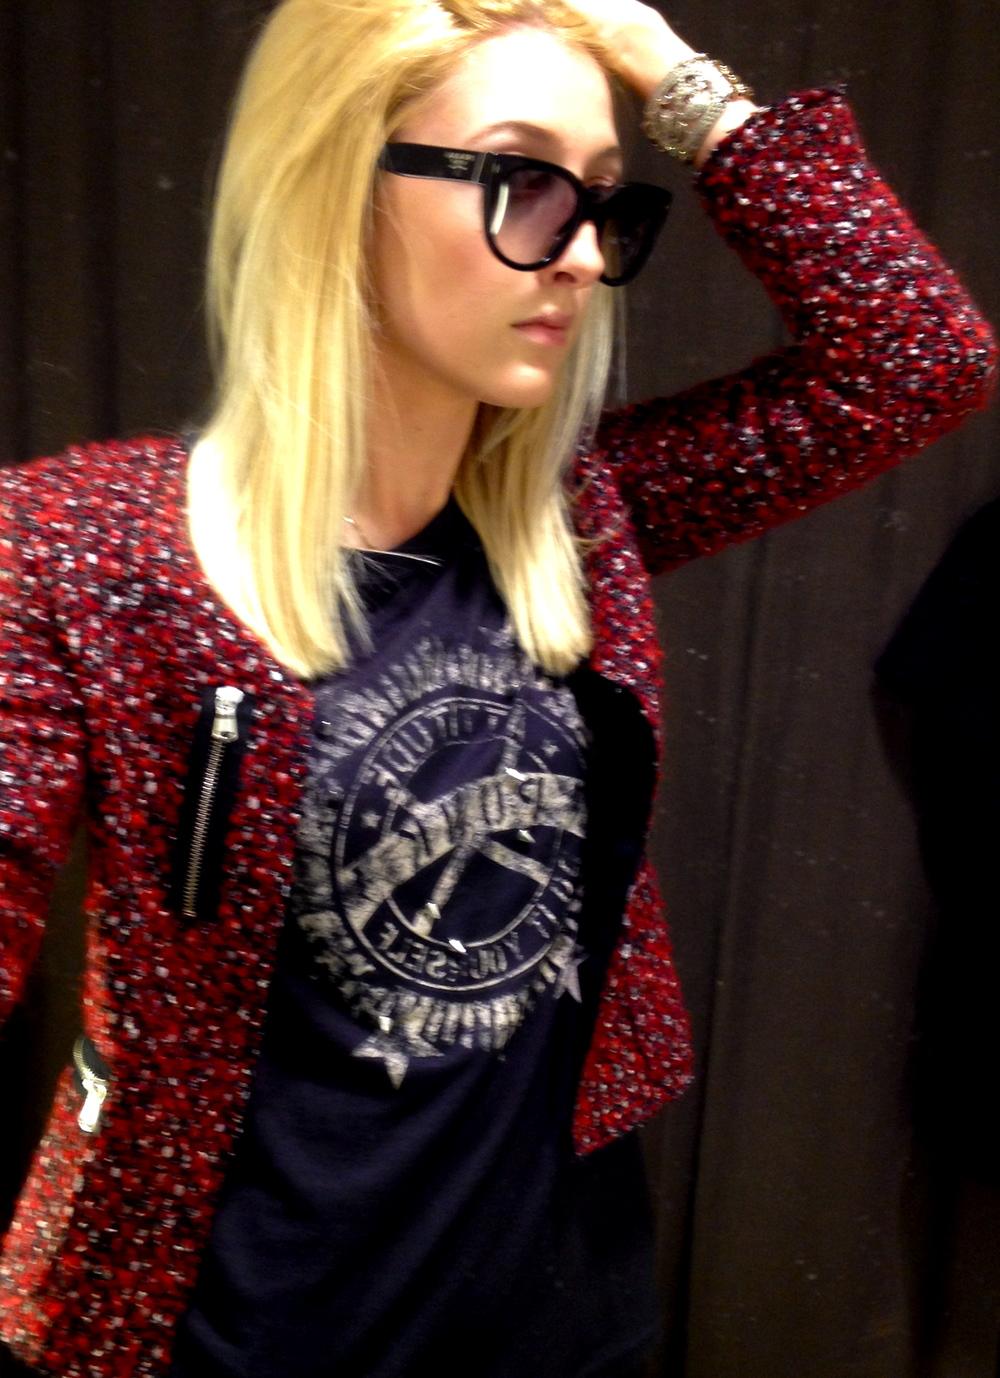 Jacket and t-shirt: ZARA // Sunglasses: Prada // Bracelet: vintage